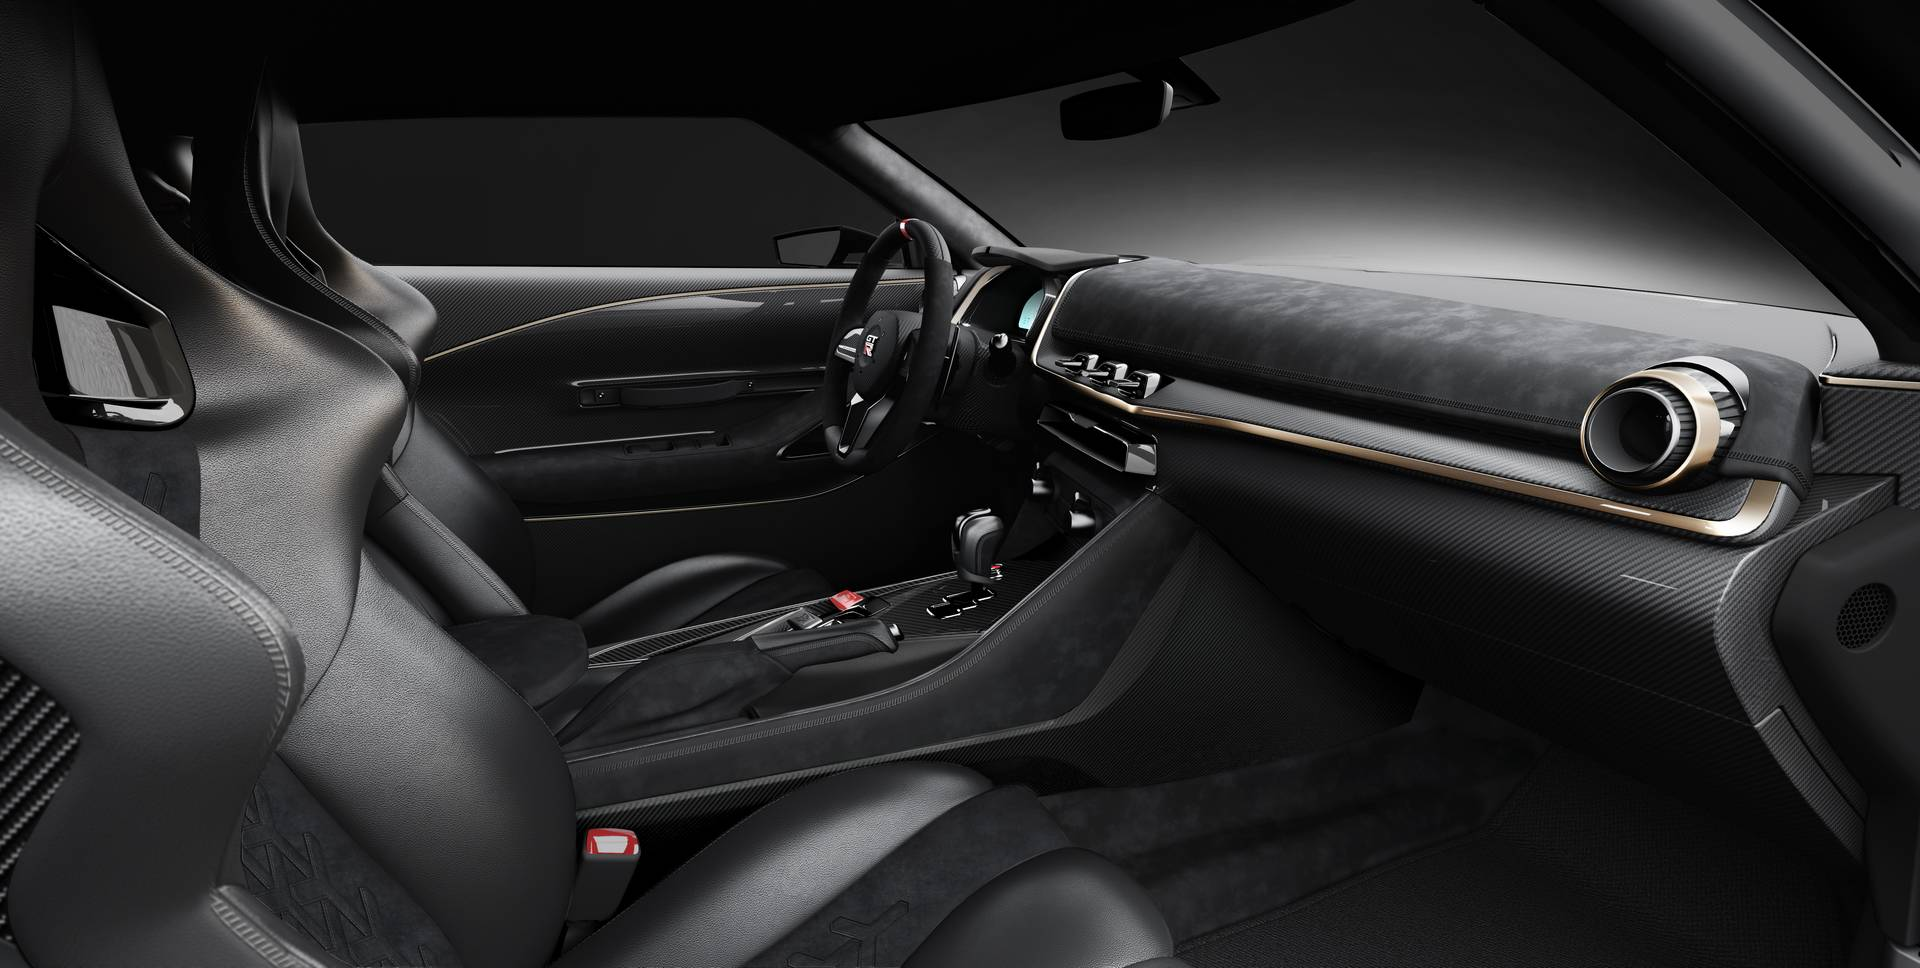 Модель прототипа основана на производстве 2018 Nissan GT-R NISMO.